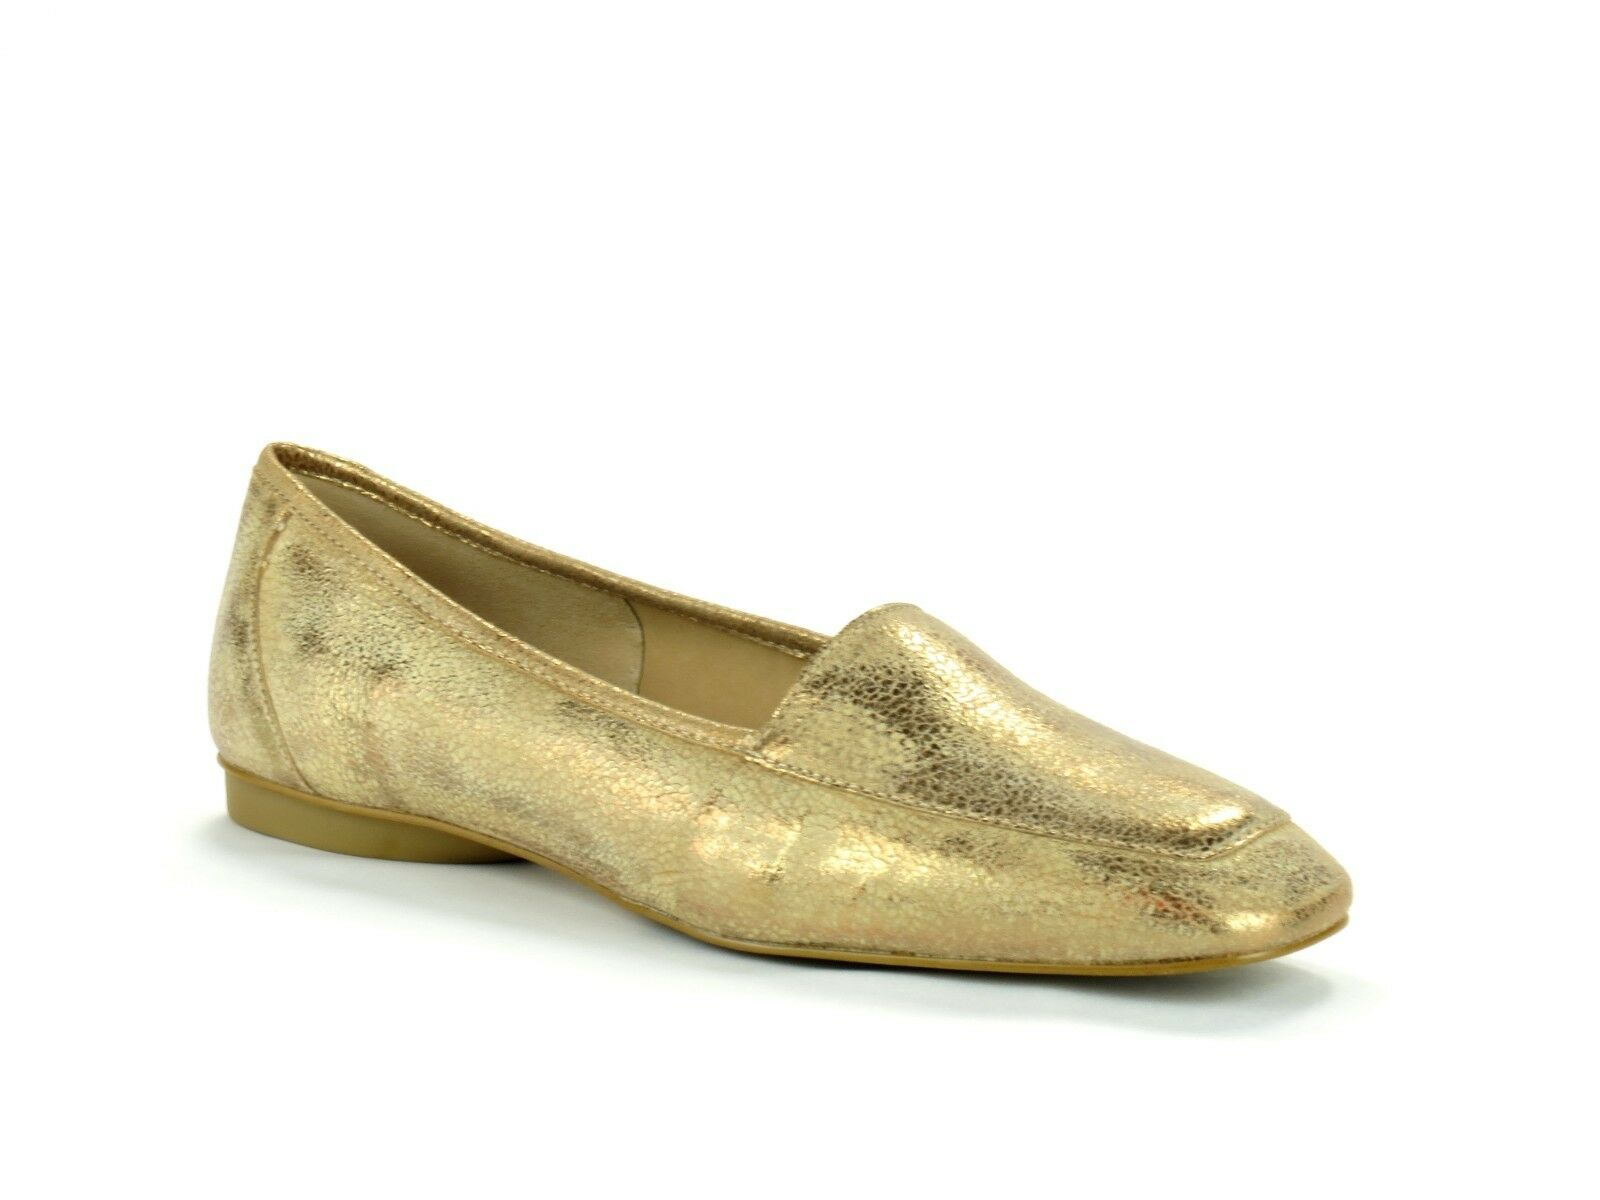 Donald J Pliner Deedee Bronze Metallic Tumbled Pelle Loafer Slip On Loafer Pelle Flat 7 ced1d0